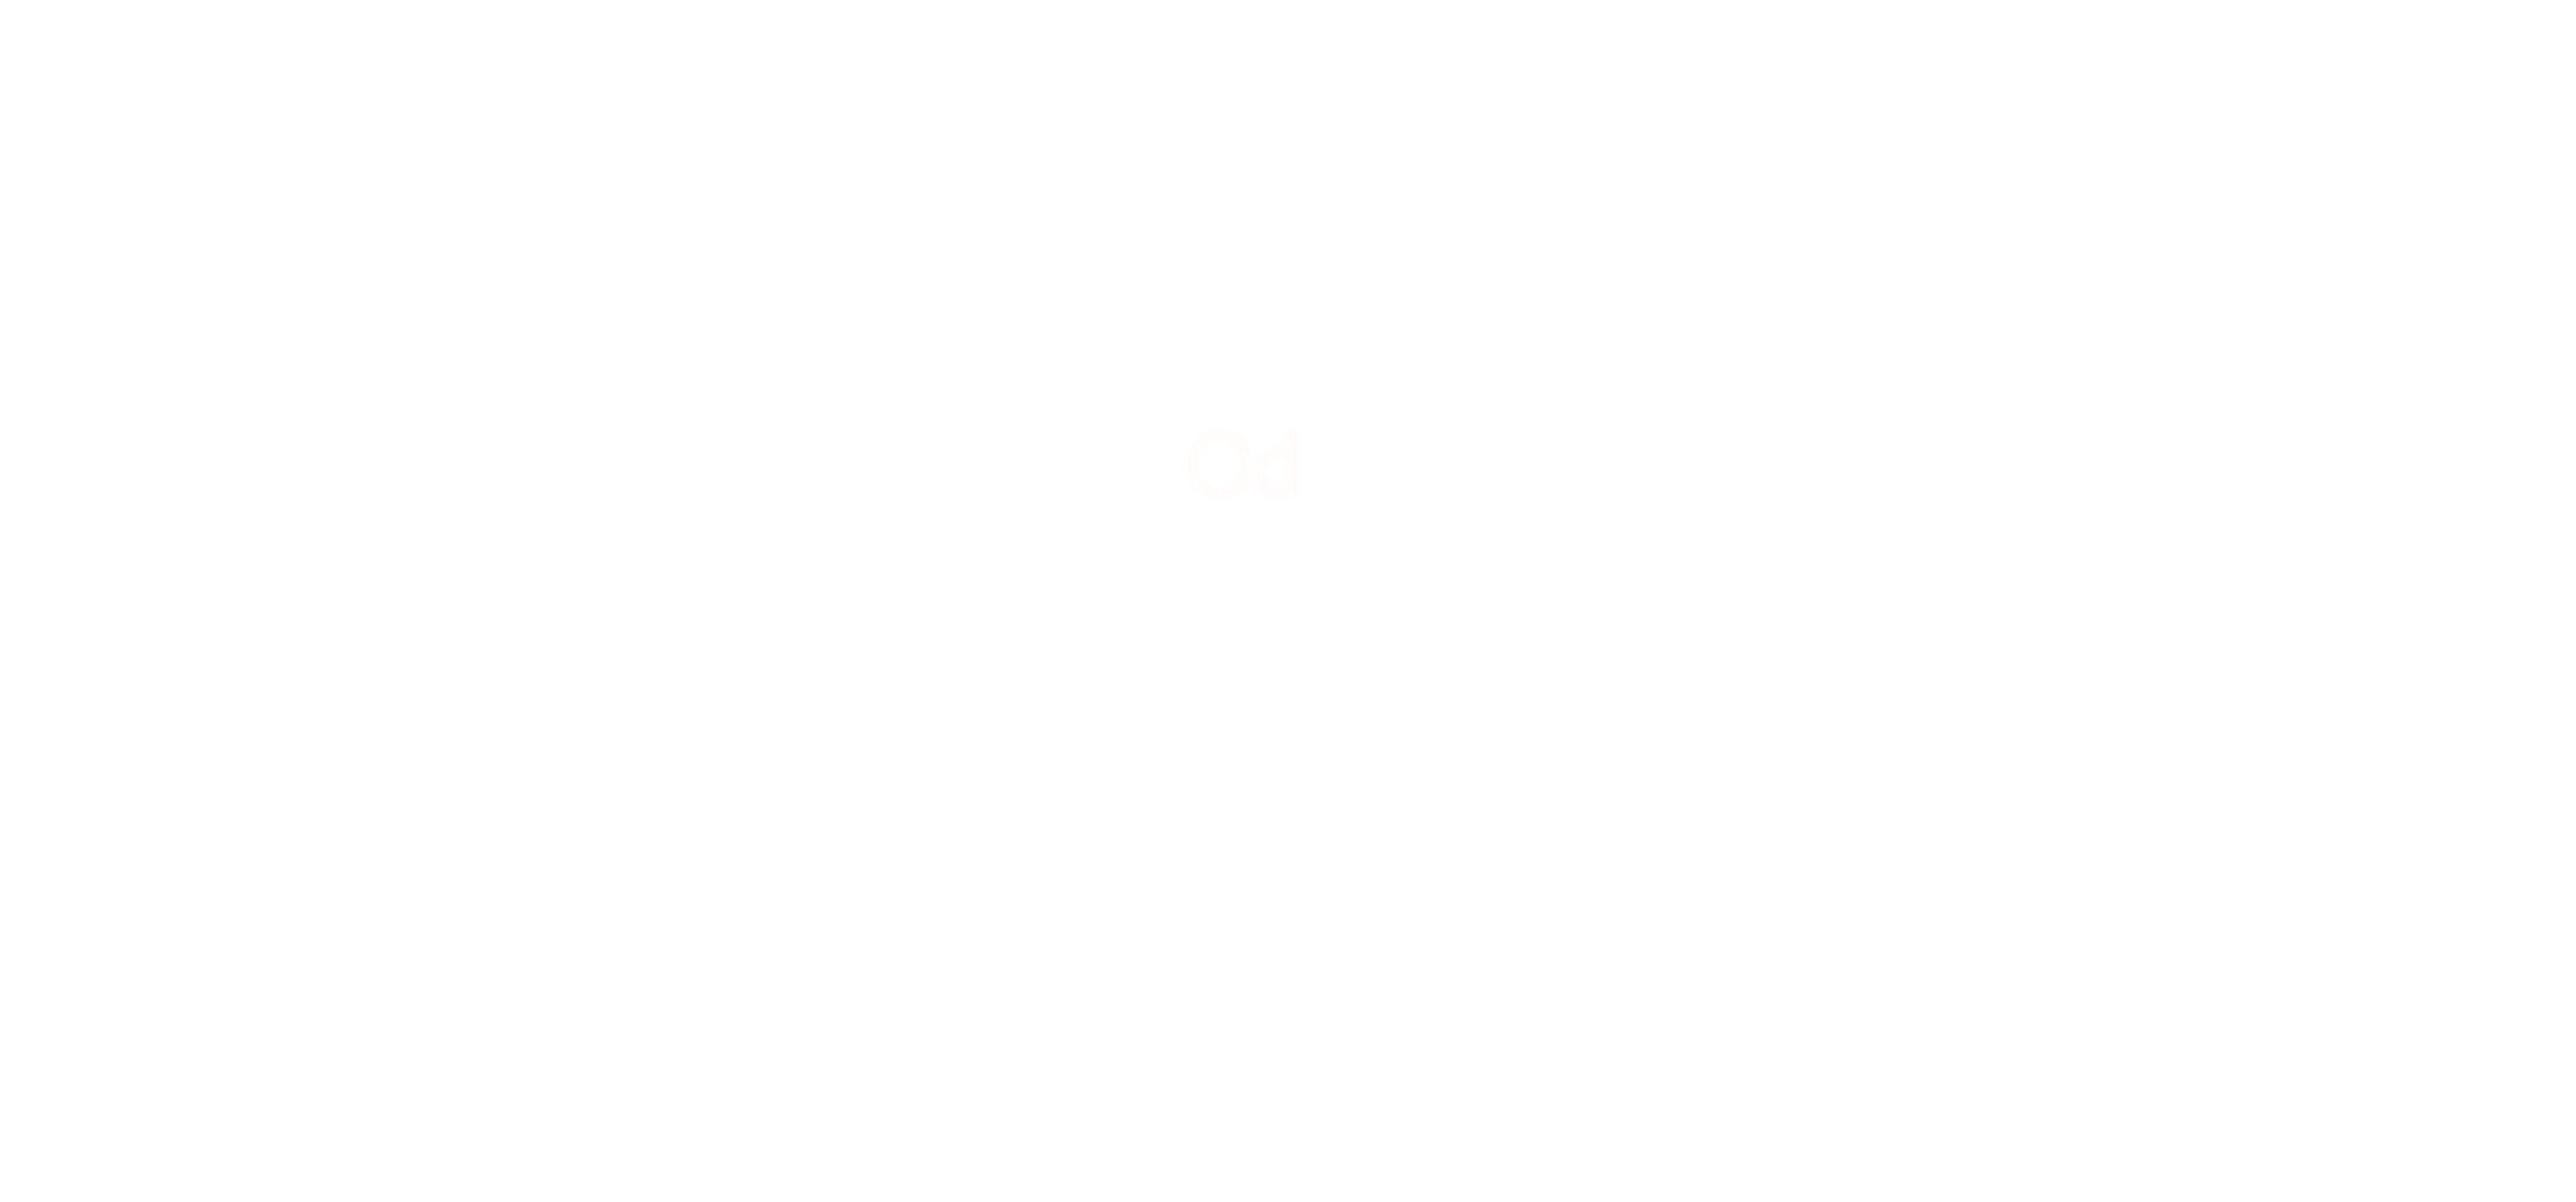 Teodoro Corbo